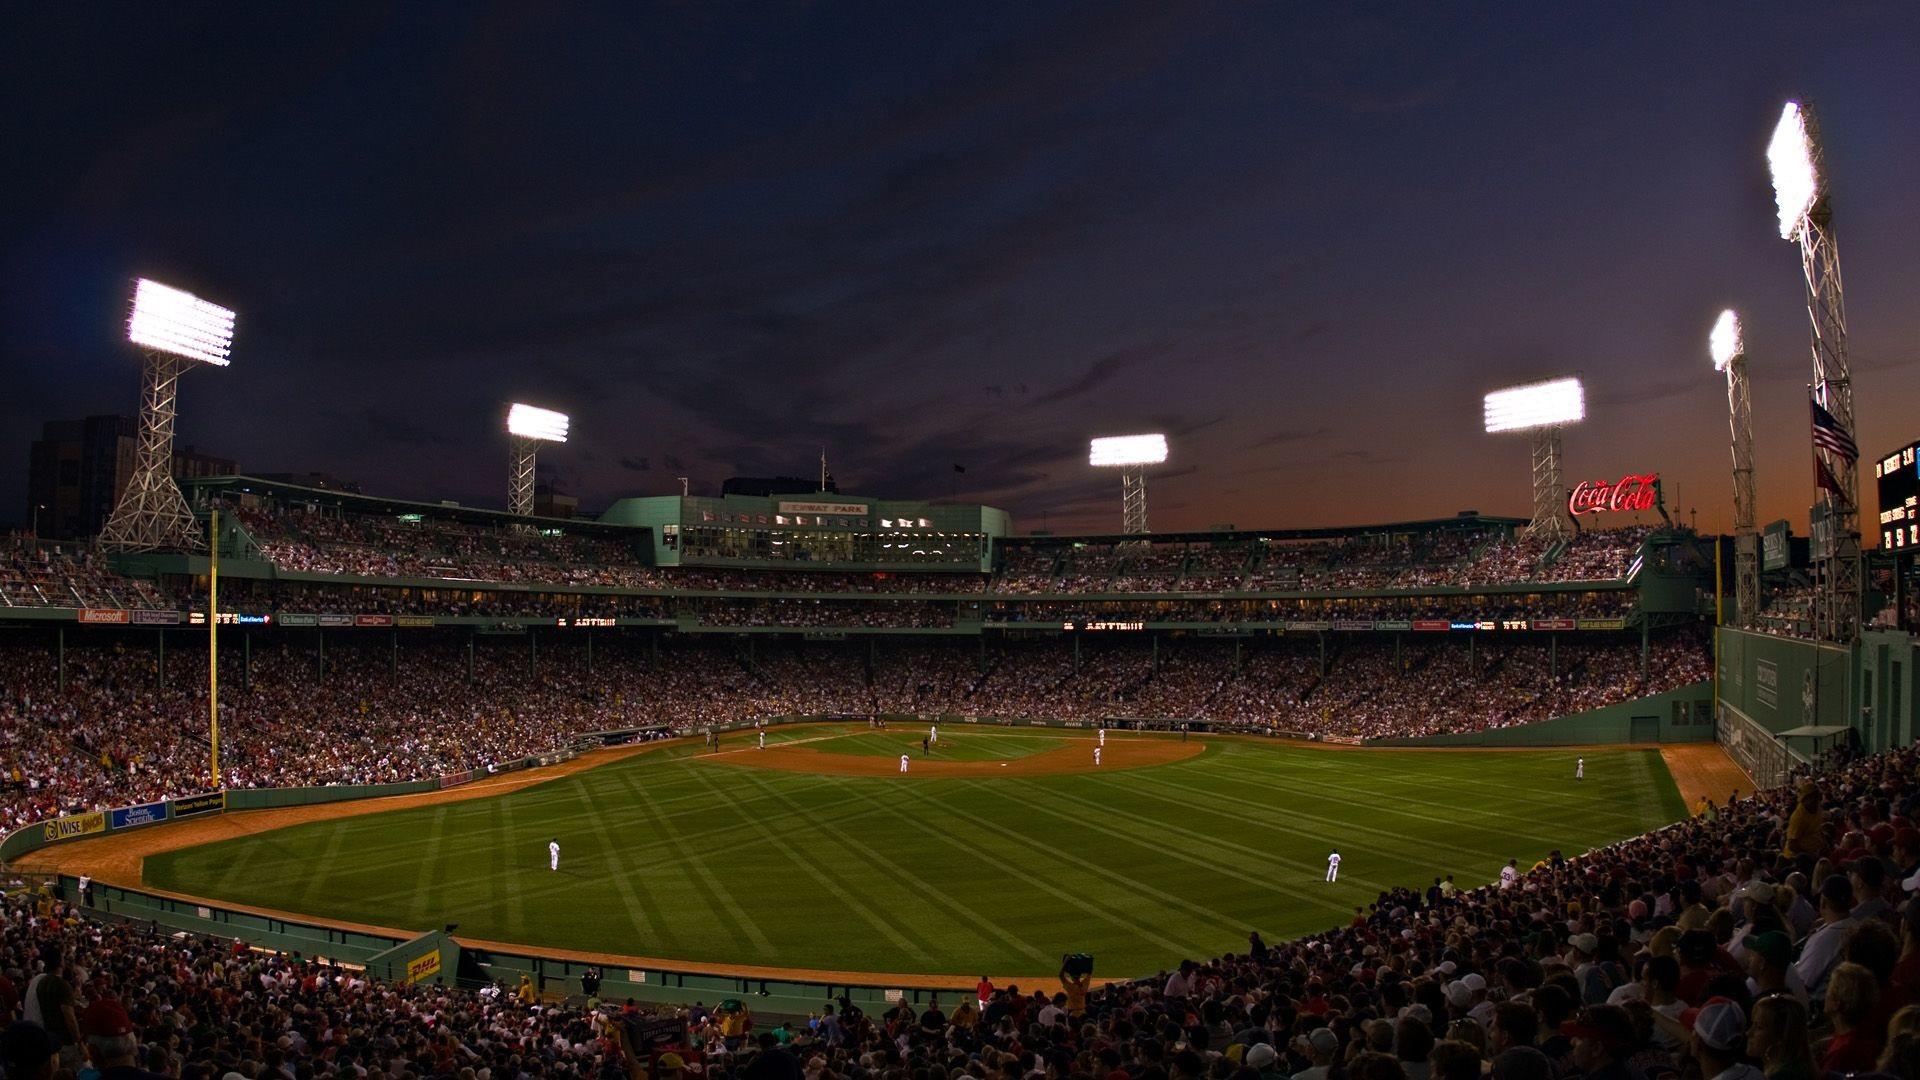 Dustin Pedroia Iphone Wallpaper Boston Red Sox Wallpaper Screensavers 61 Images